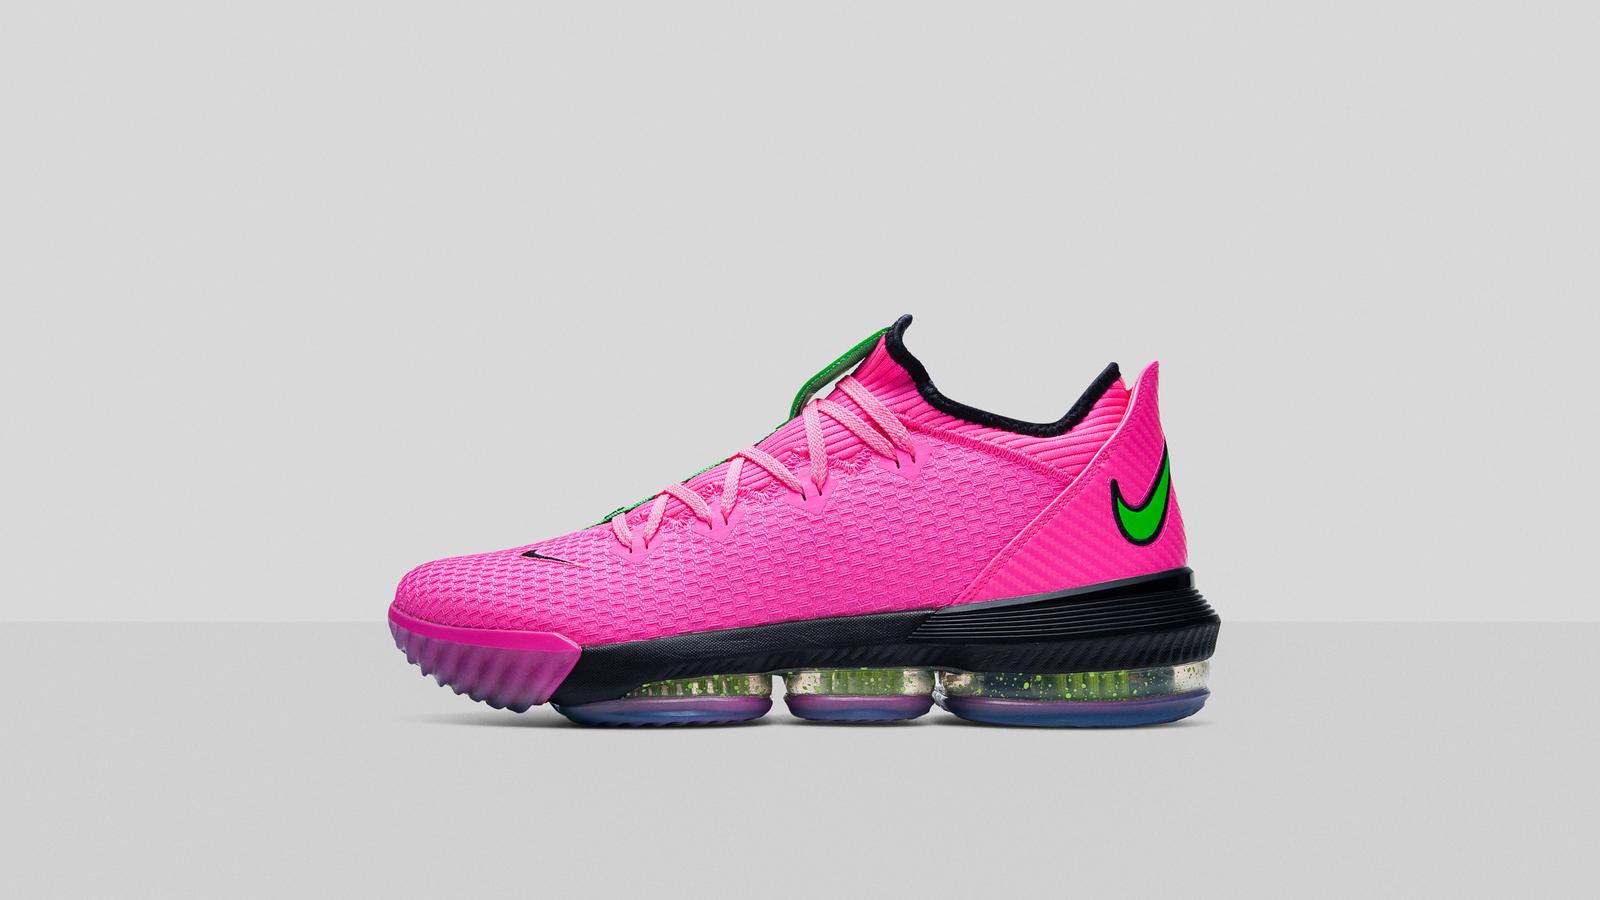 FeaturedFootwear_WNBA_ASG2019-2221_89479.jpg